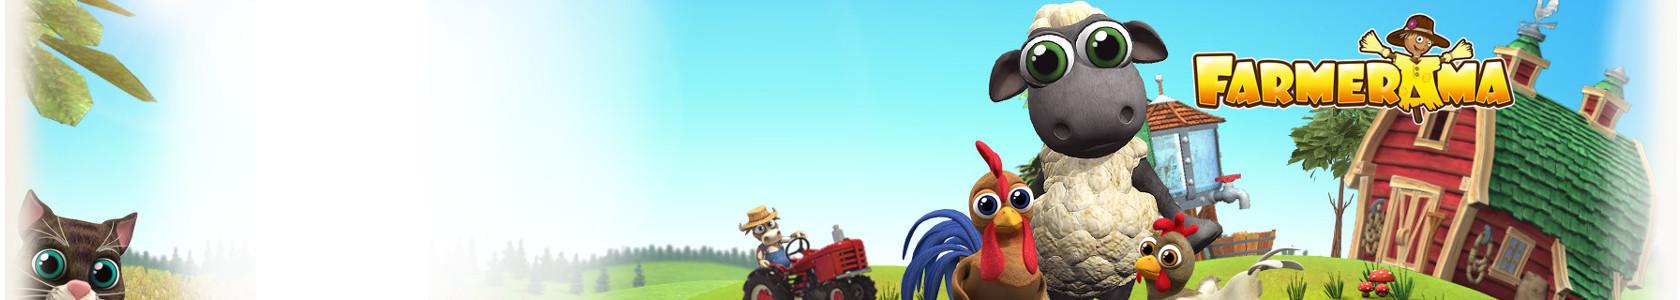 Farmerama die bekannte Farm Simulation